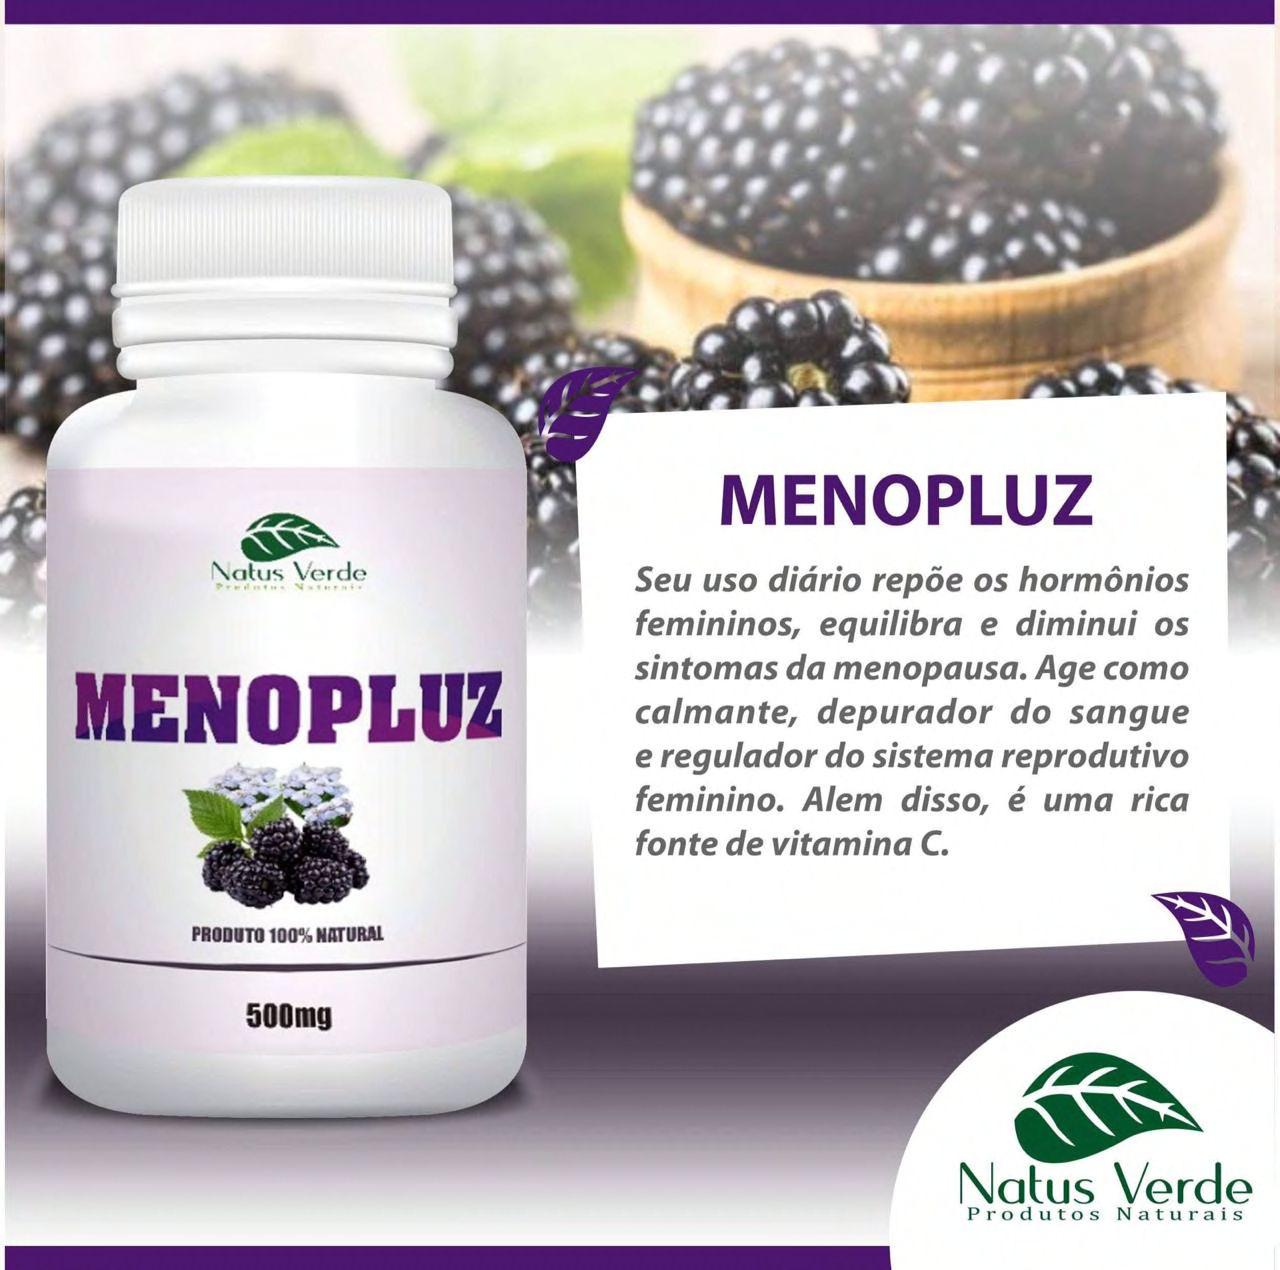 Composto Natural Menopluz 60 Caps Natus Verde  - Fribasex - Fabricasex.com